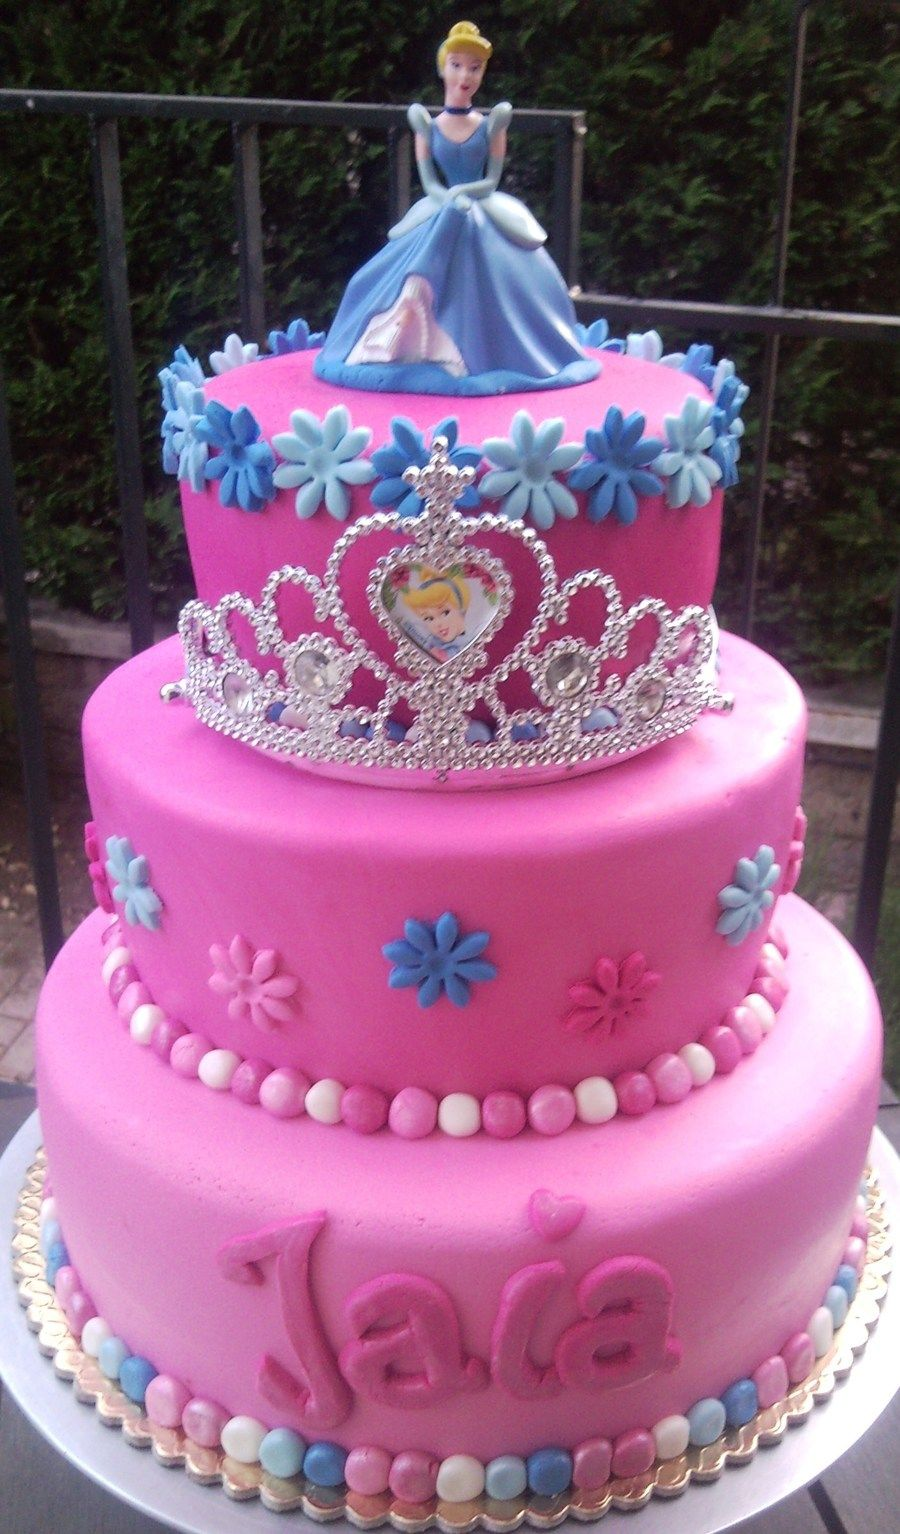 Princess Cinderella 3 tier cake Alyson Pinterest Tiered cakes